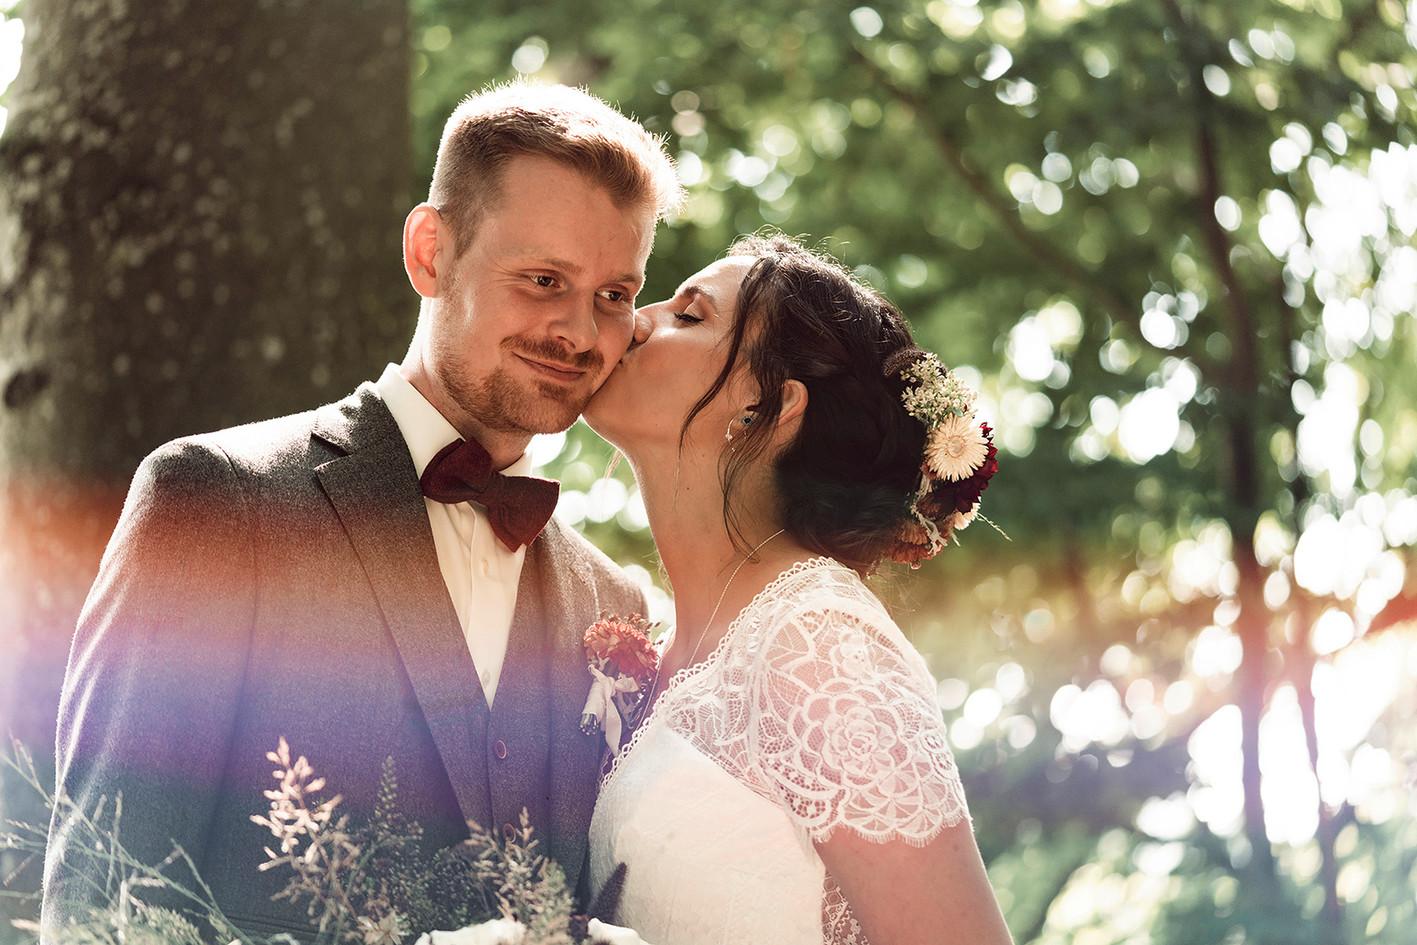 100-married-united-wedding-suephotoart-p